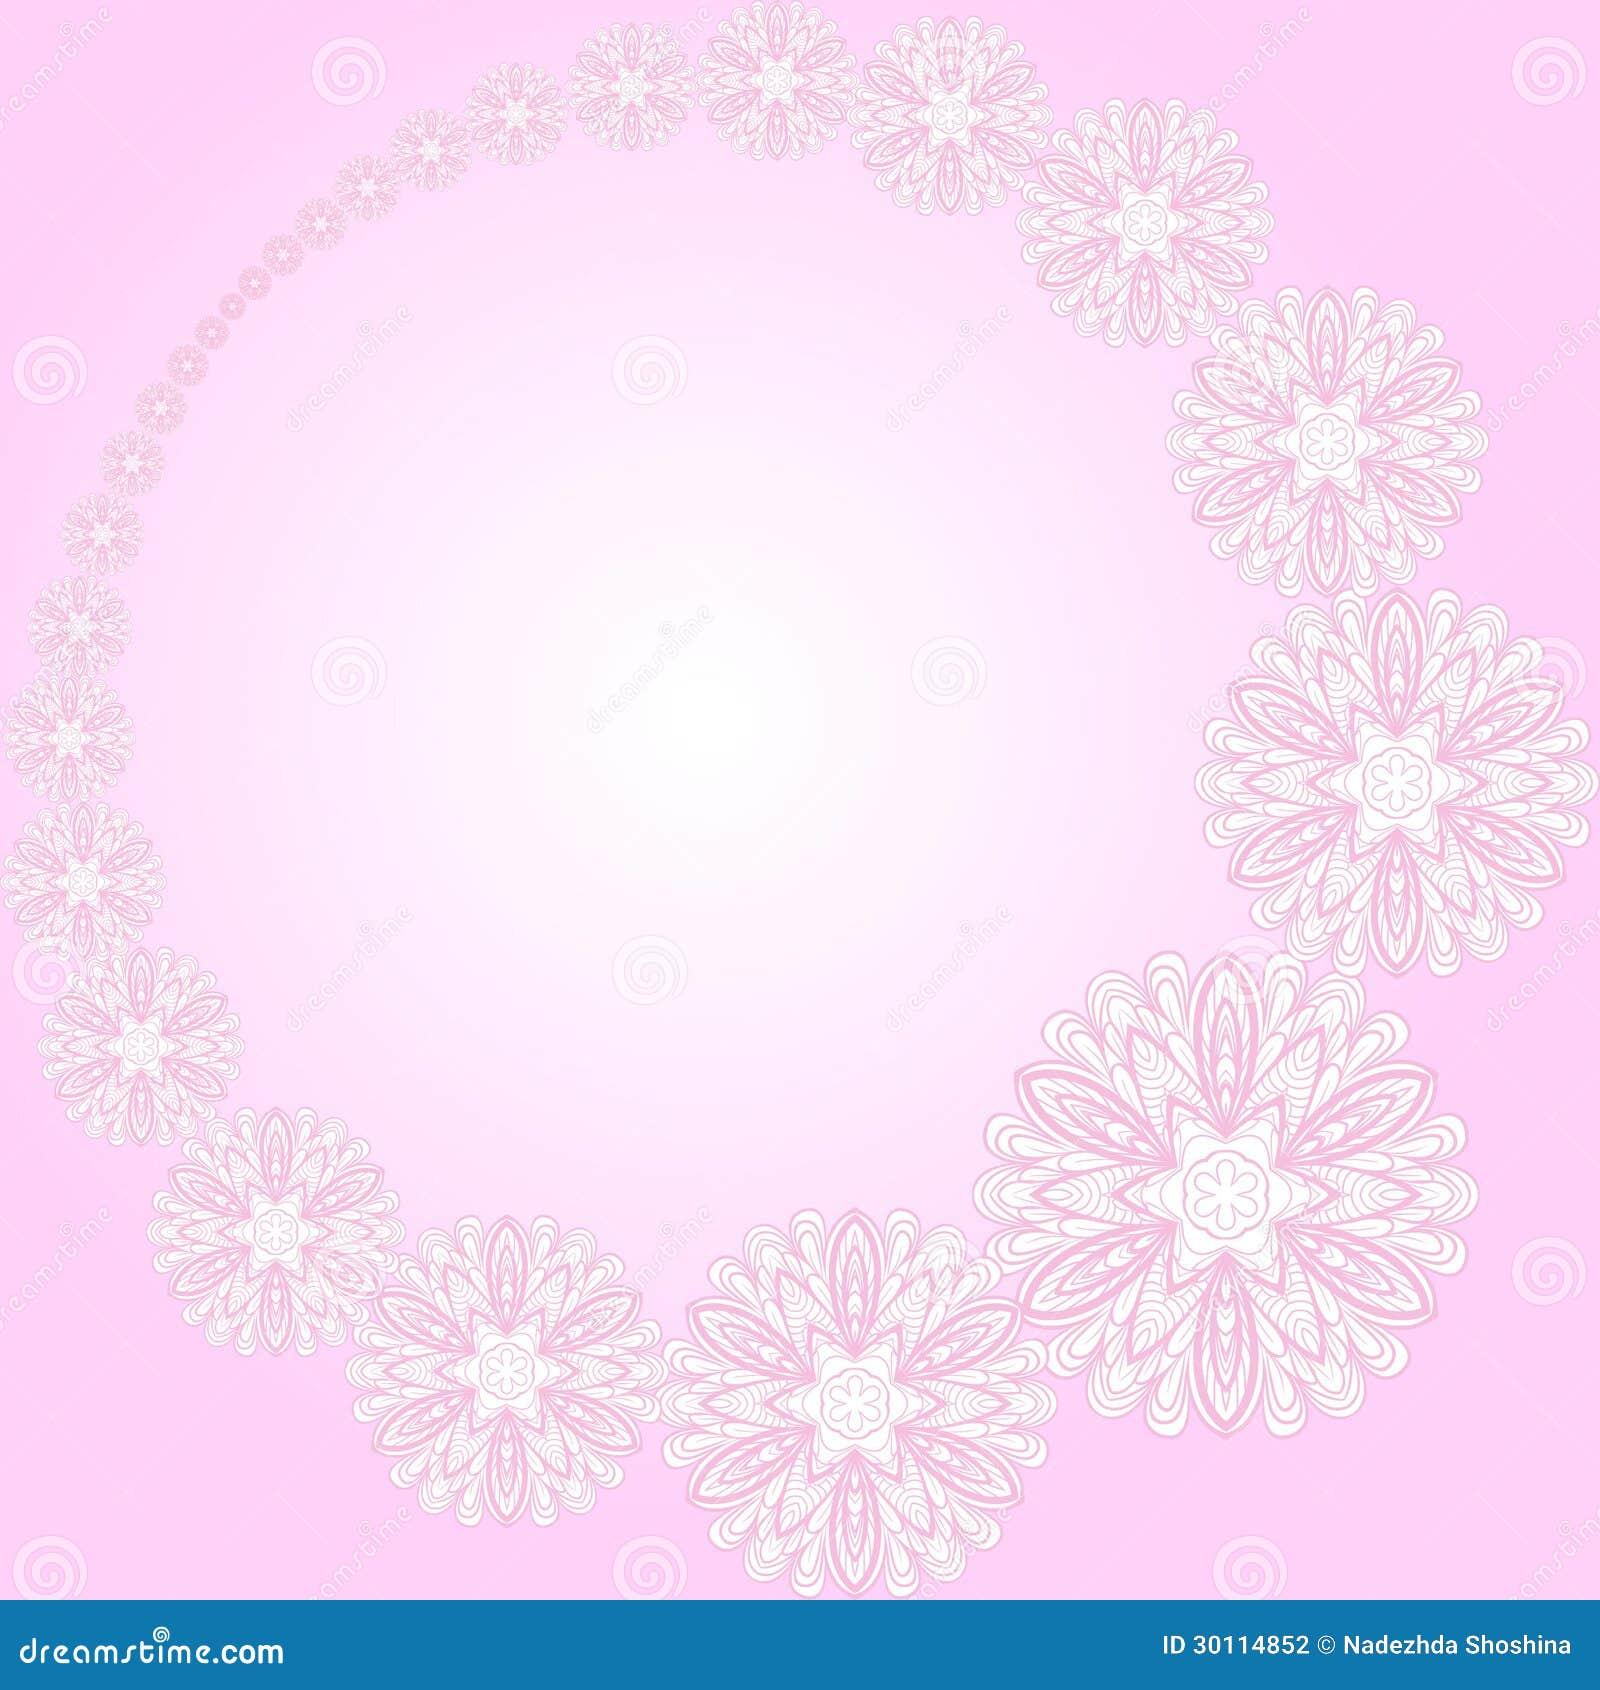 cadre rond rose avec des fleurs photographie stock image. Black Bedroom Furniture Sets. Home Design Ideas